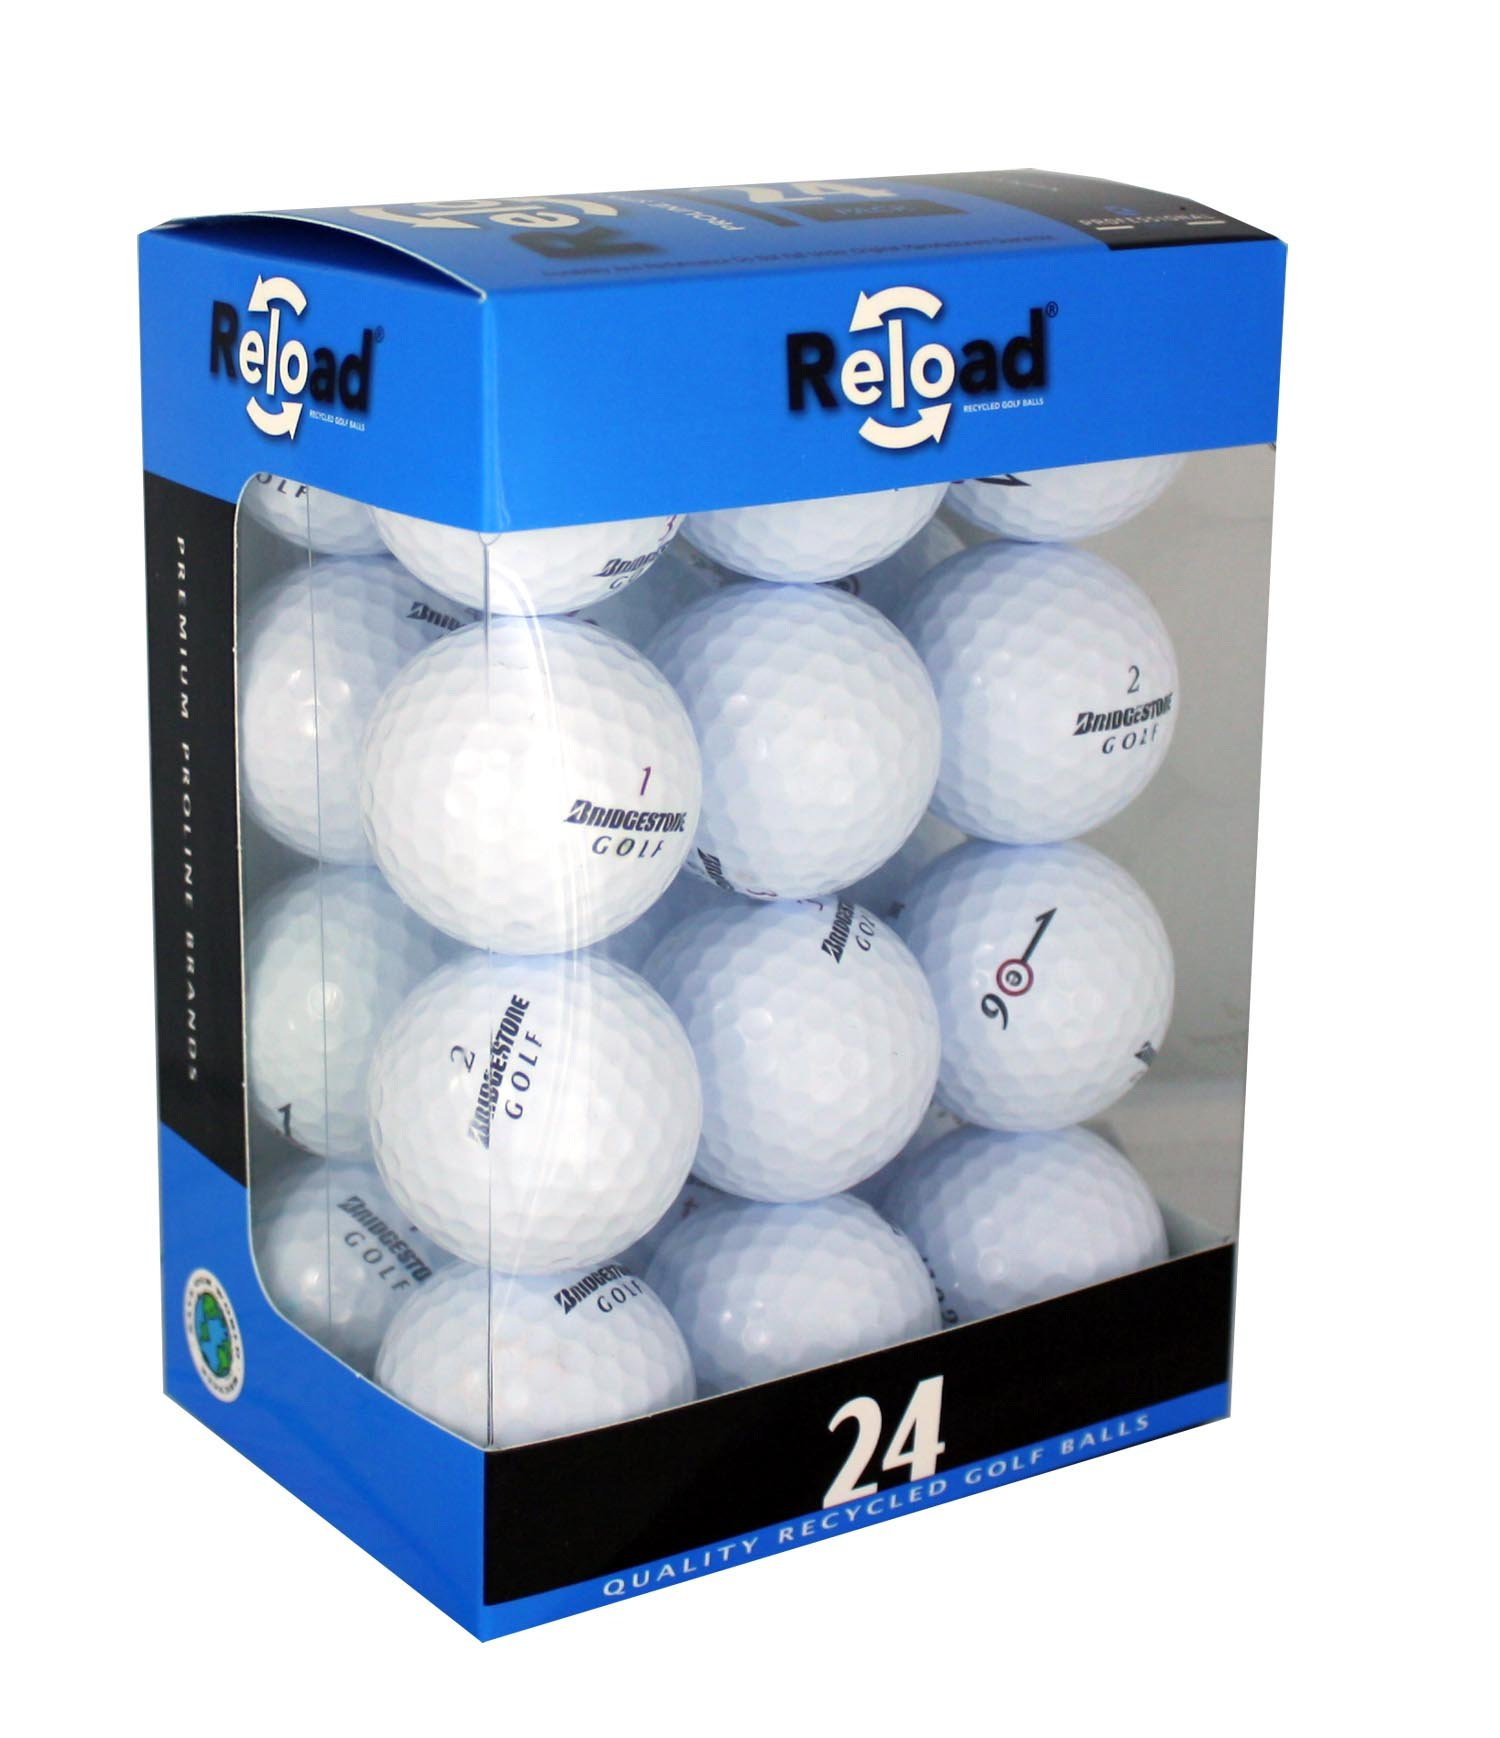 Bridgestone Reload Recycled Golf Balls (24-Pack) of Golf Balls